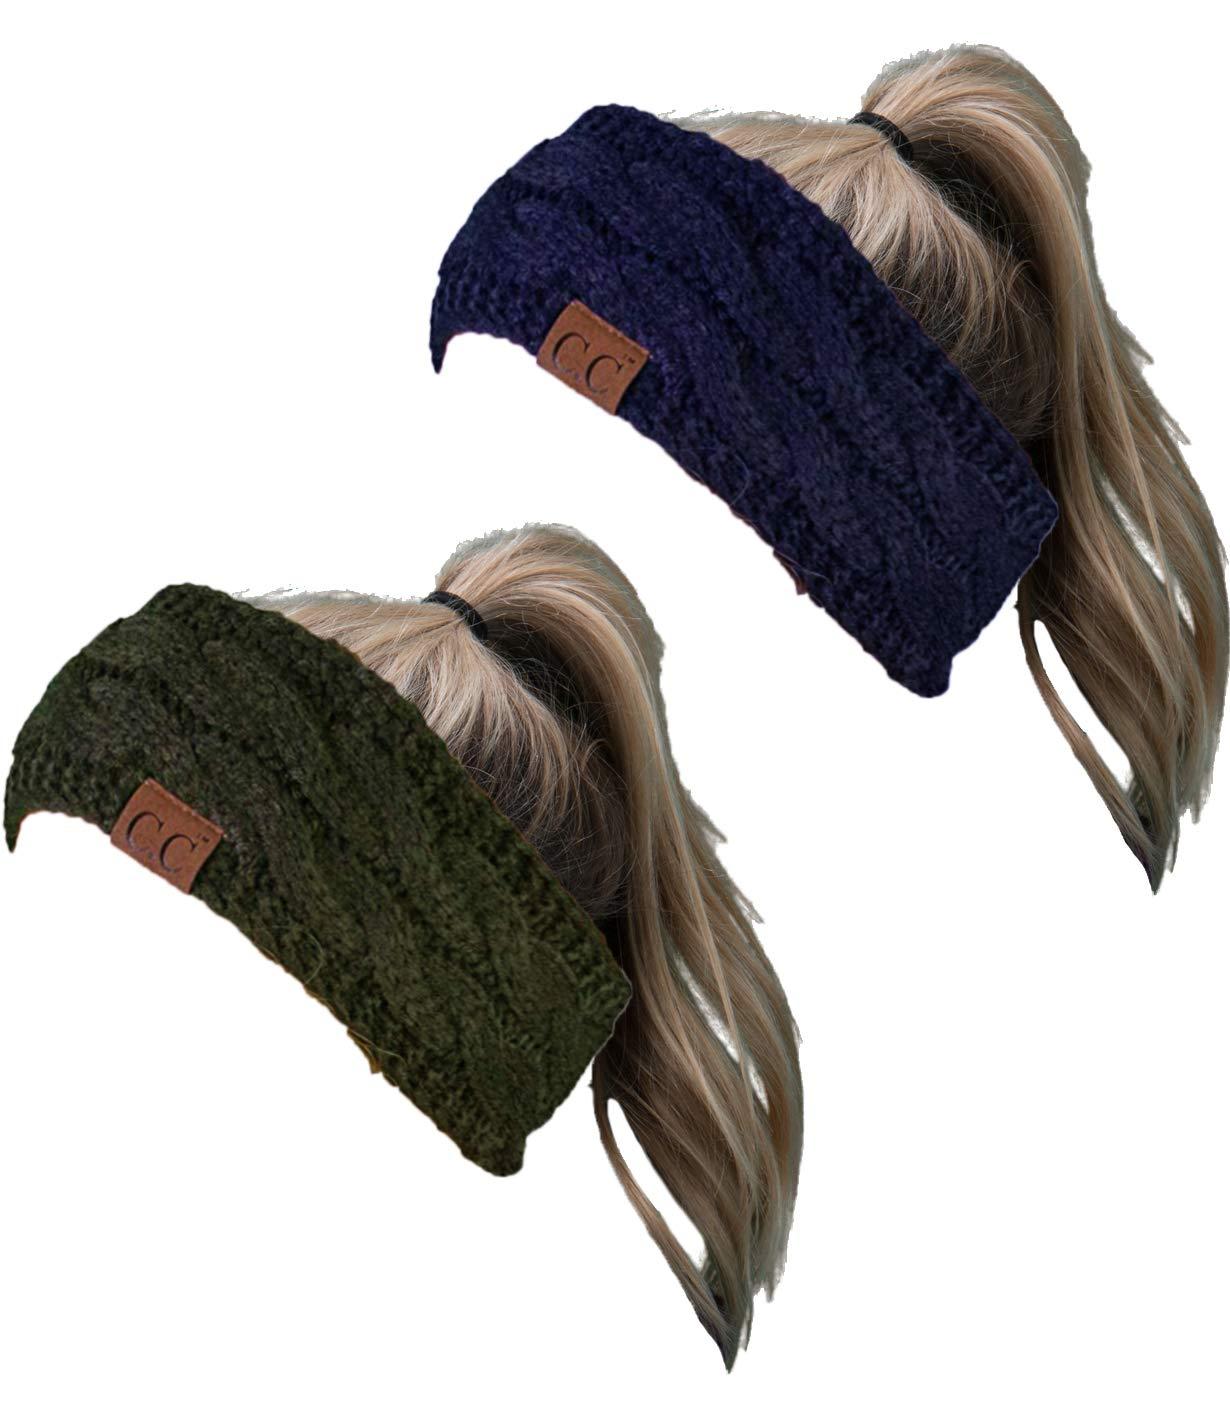 HW-6033-2-20a-3133 Headwrap Bundle - Solid Navy & Solid Olive (2 Pack)